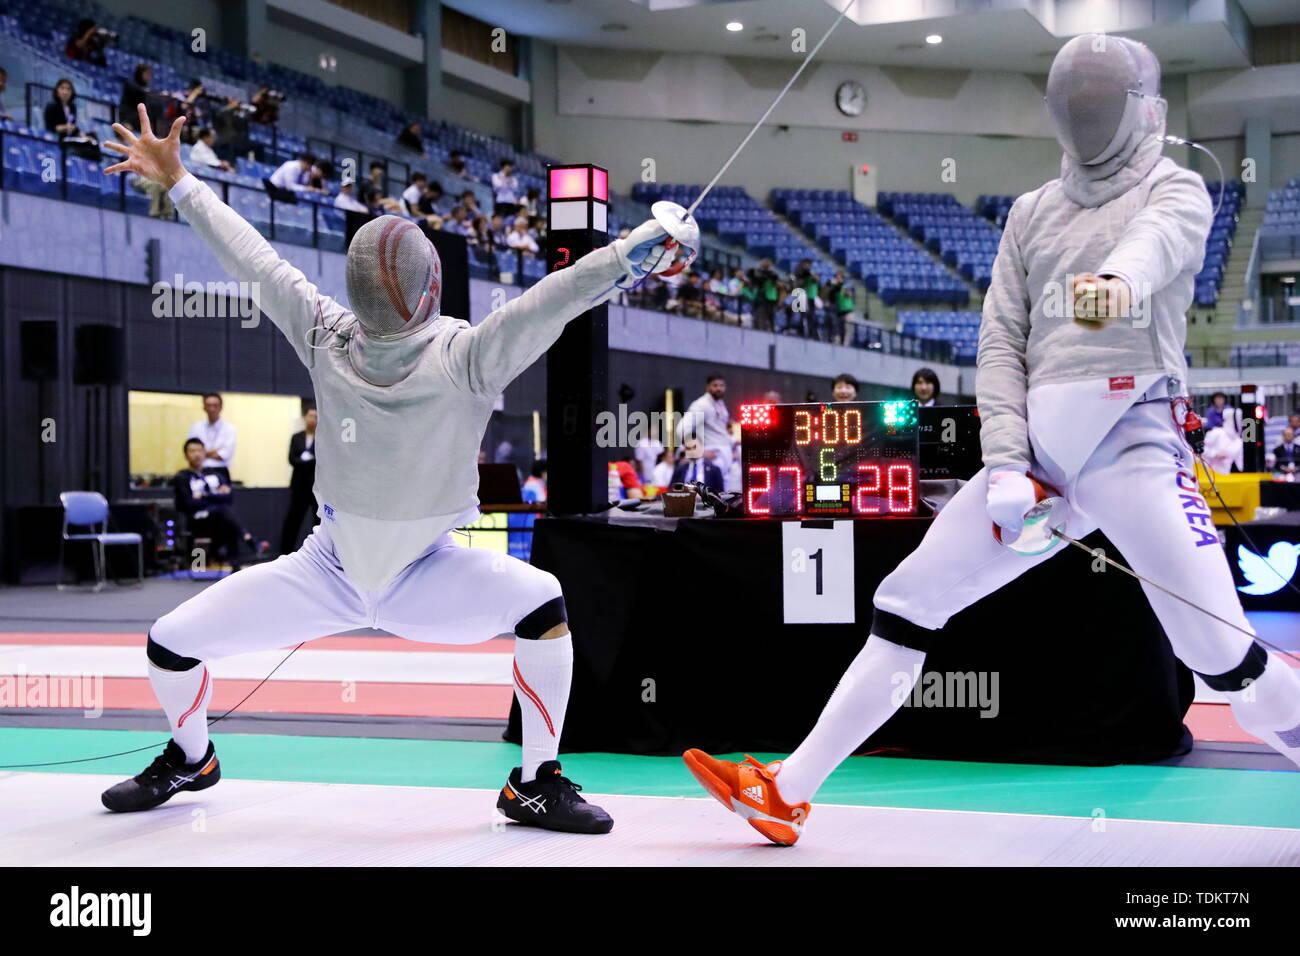 Chiba Port Arena, Chiba, Japan. 17th June, 2019. (L-R) Kenta Tokunan (JPN), Oh Sanguk (KOR), JUNE 17, 2019 - Fencing : 2019 Asian Fencing Championships Men's Team Sabre at Chiba Port Arena, Chiba, Japan. Credit: Naoki Nishimura/AFLO SPORT/Alamy Live News - Stock Image